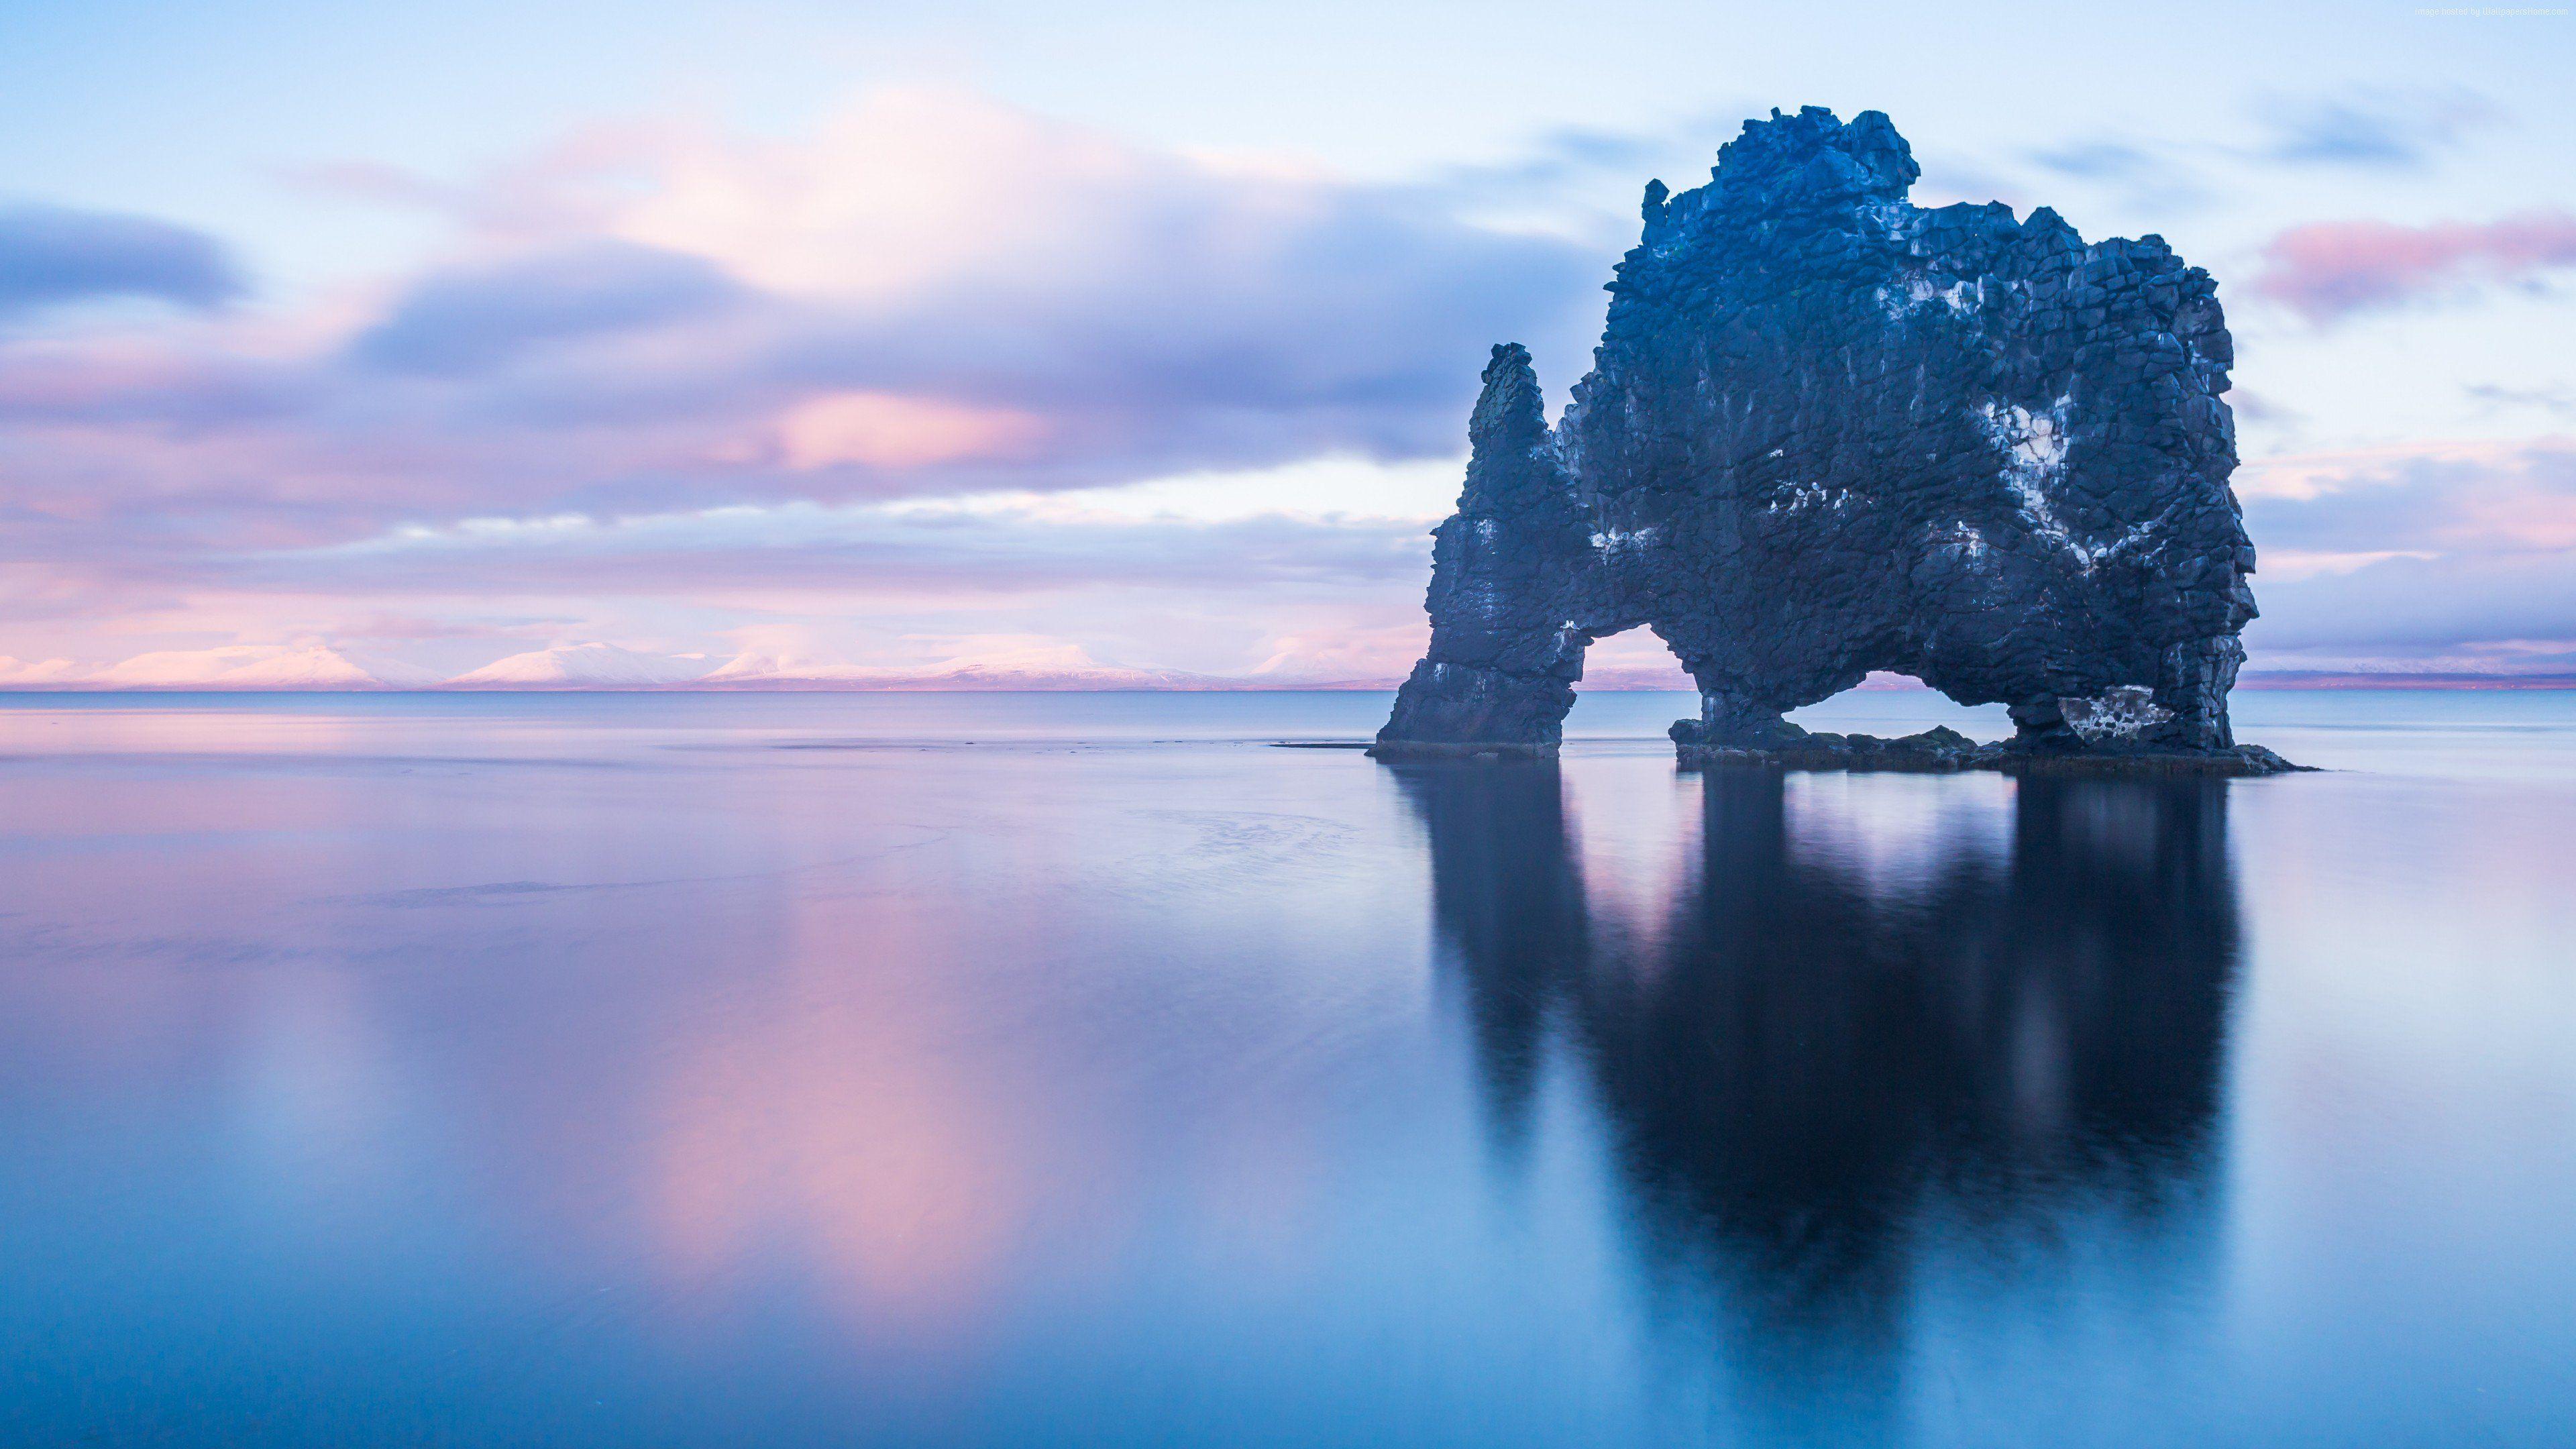 Ocean Rock Iceland 4k Wallpaper Road Trip Usa West Iceland Valley Of Fire